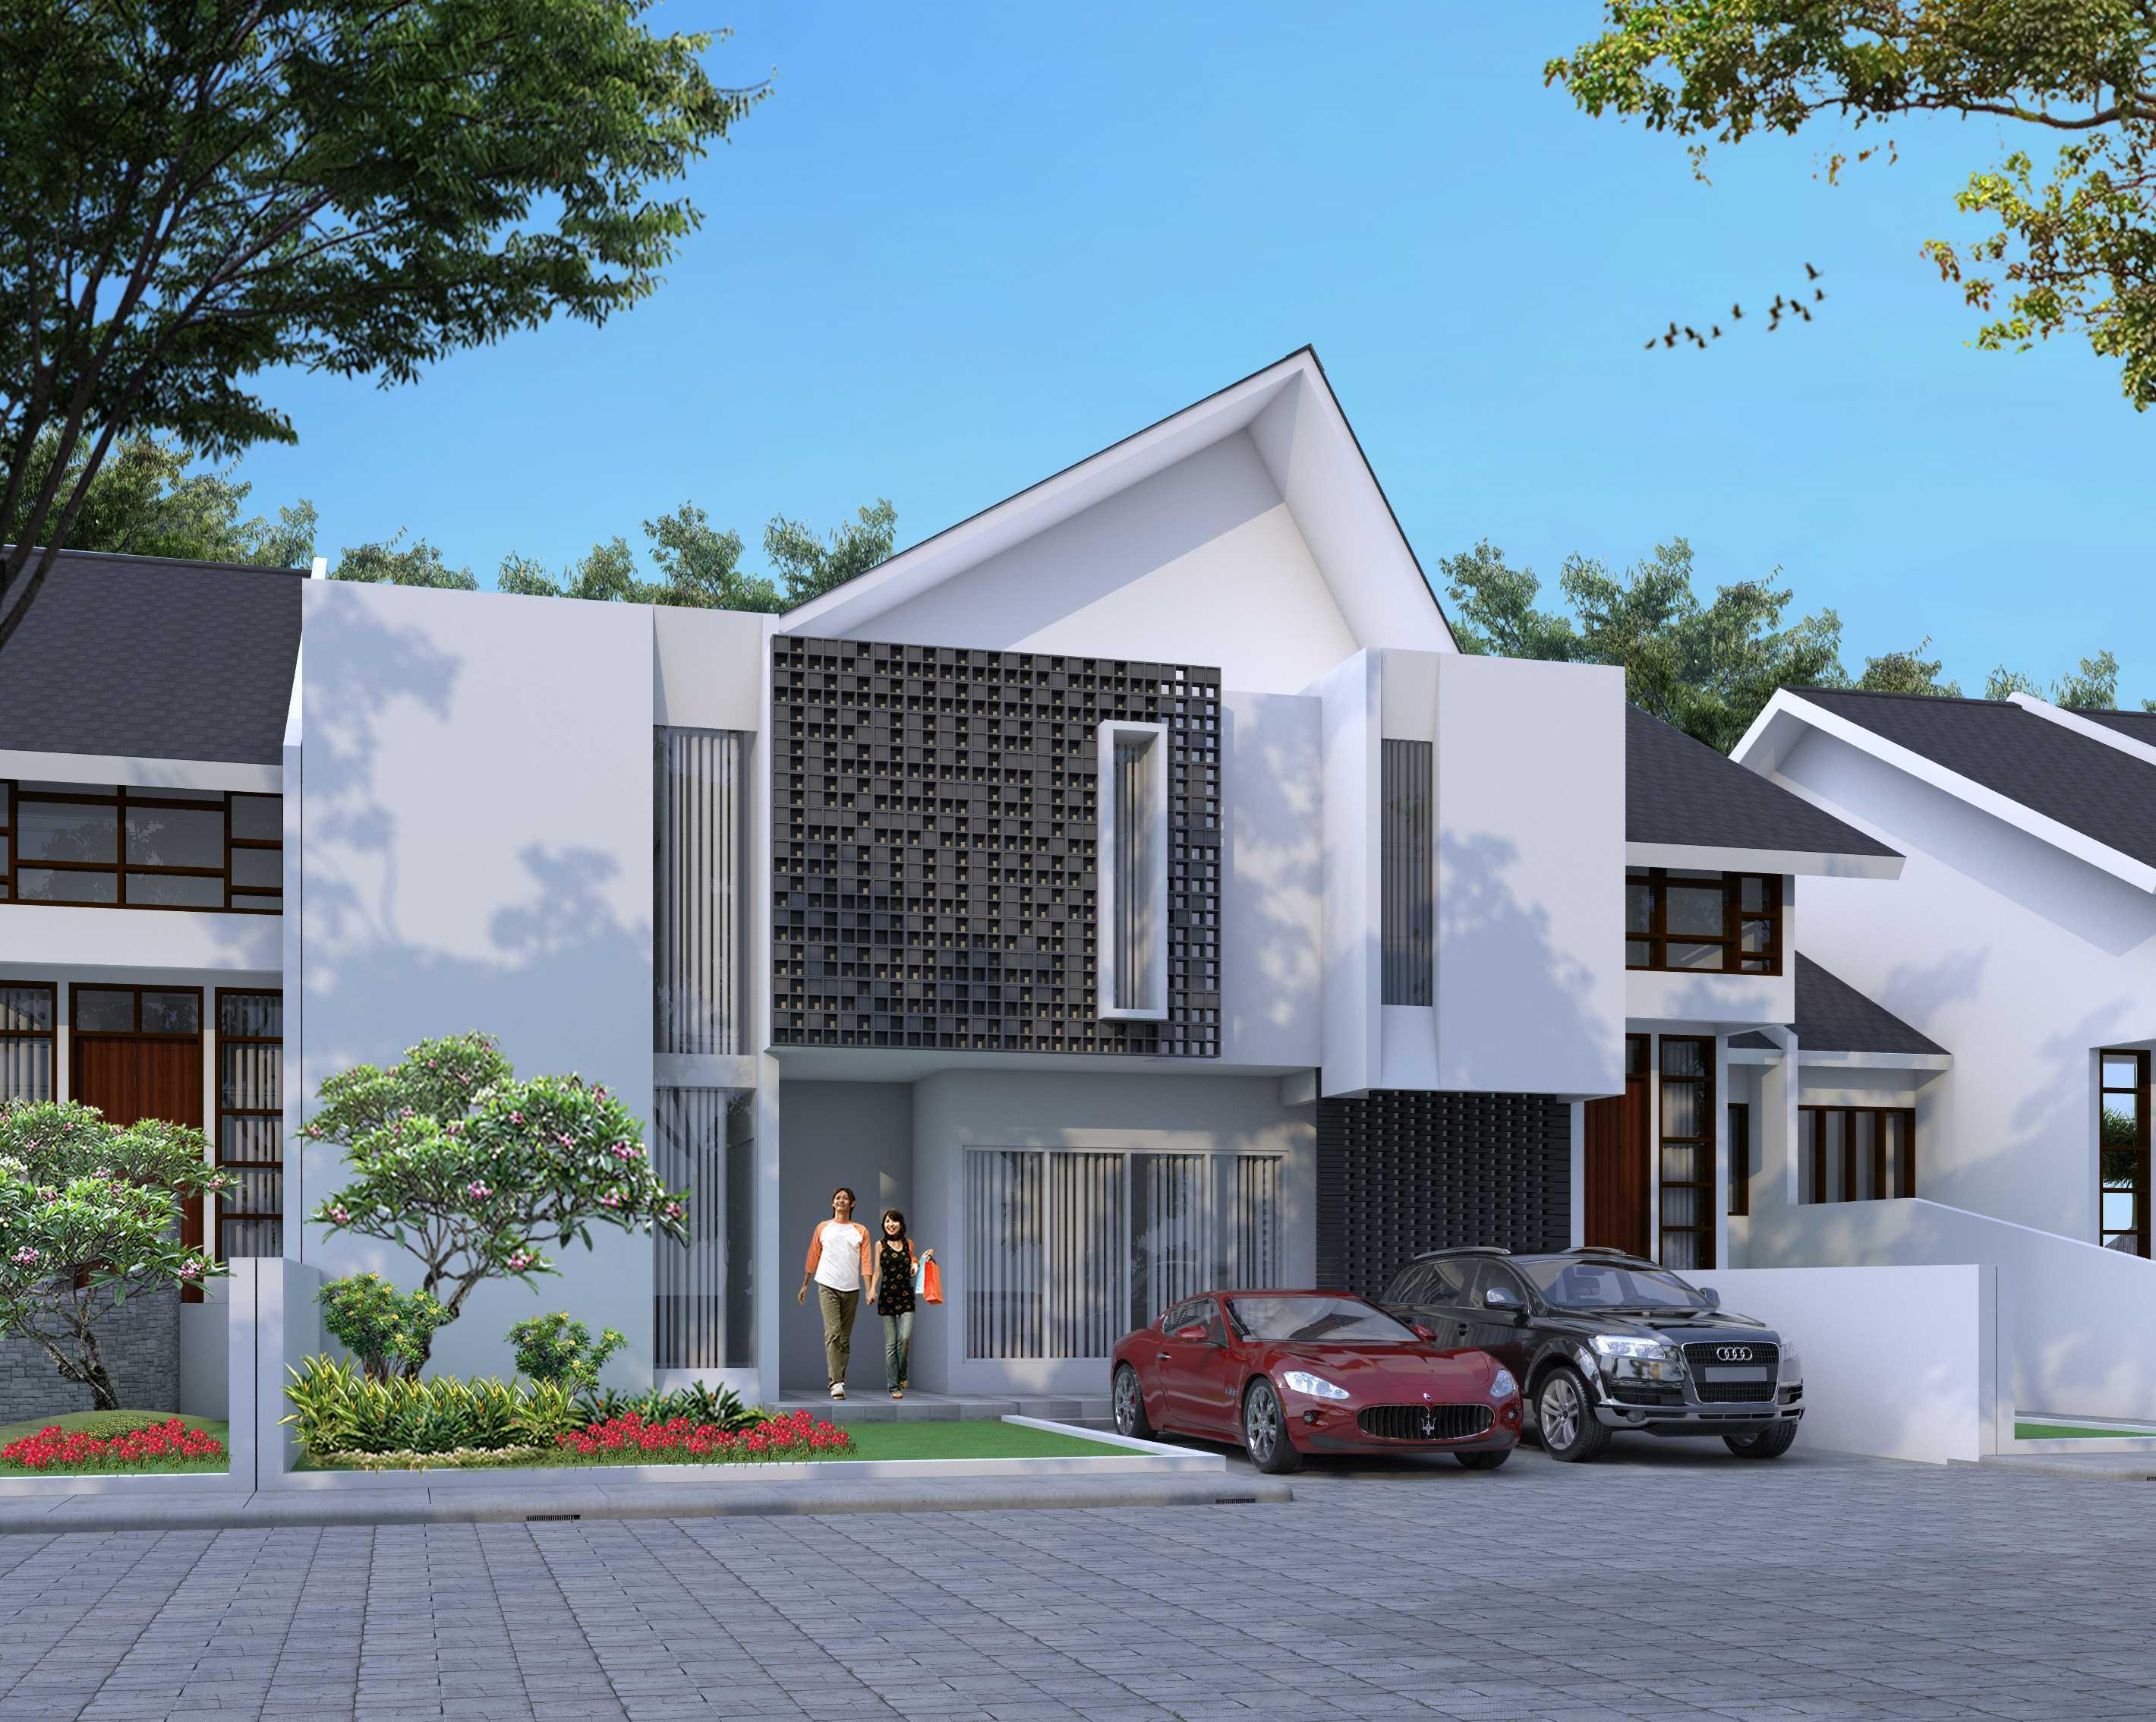 Alinea  Architects Wd House Jl. Jalur Sutera, Kunciran, Pinang, Kota Tangerang, Banten 15143, Indonesia  Front View Rendering Minimalist <P>Facade</p> 39747